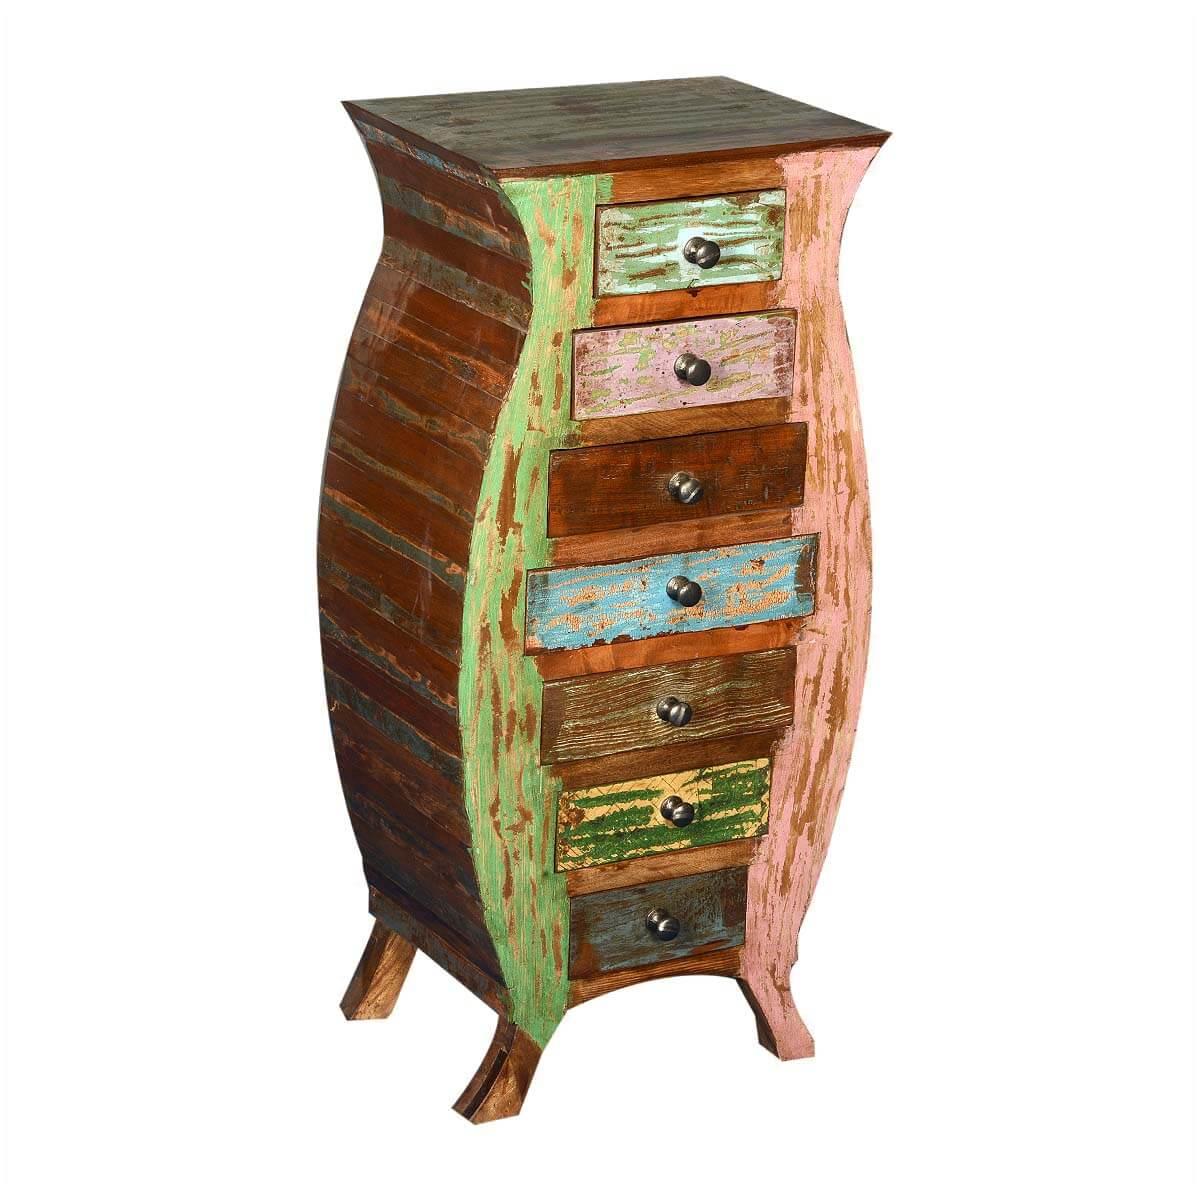 Reclaimed Wood Rustic Novelty Bombe Chest 7 Drawer Dresser